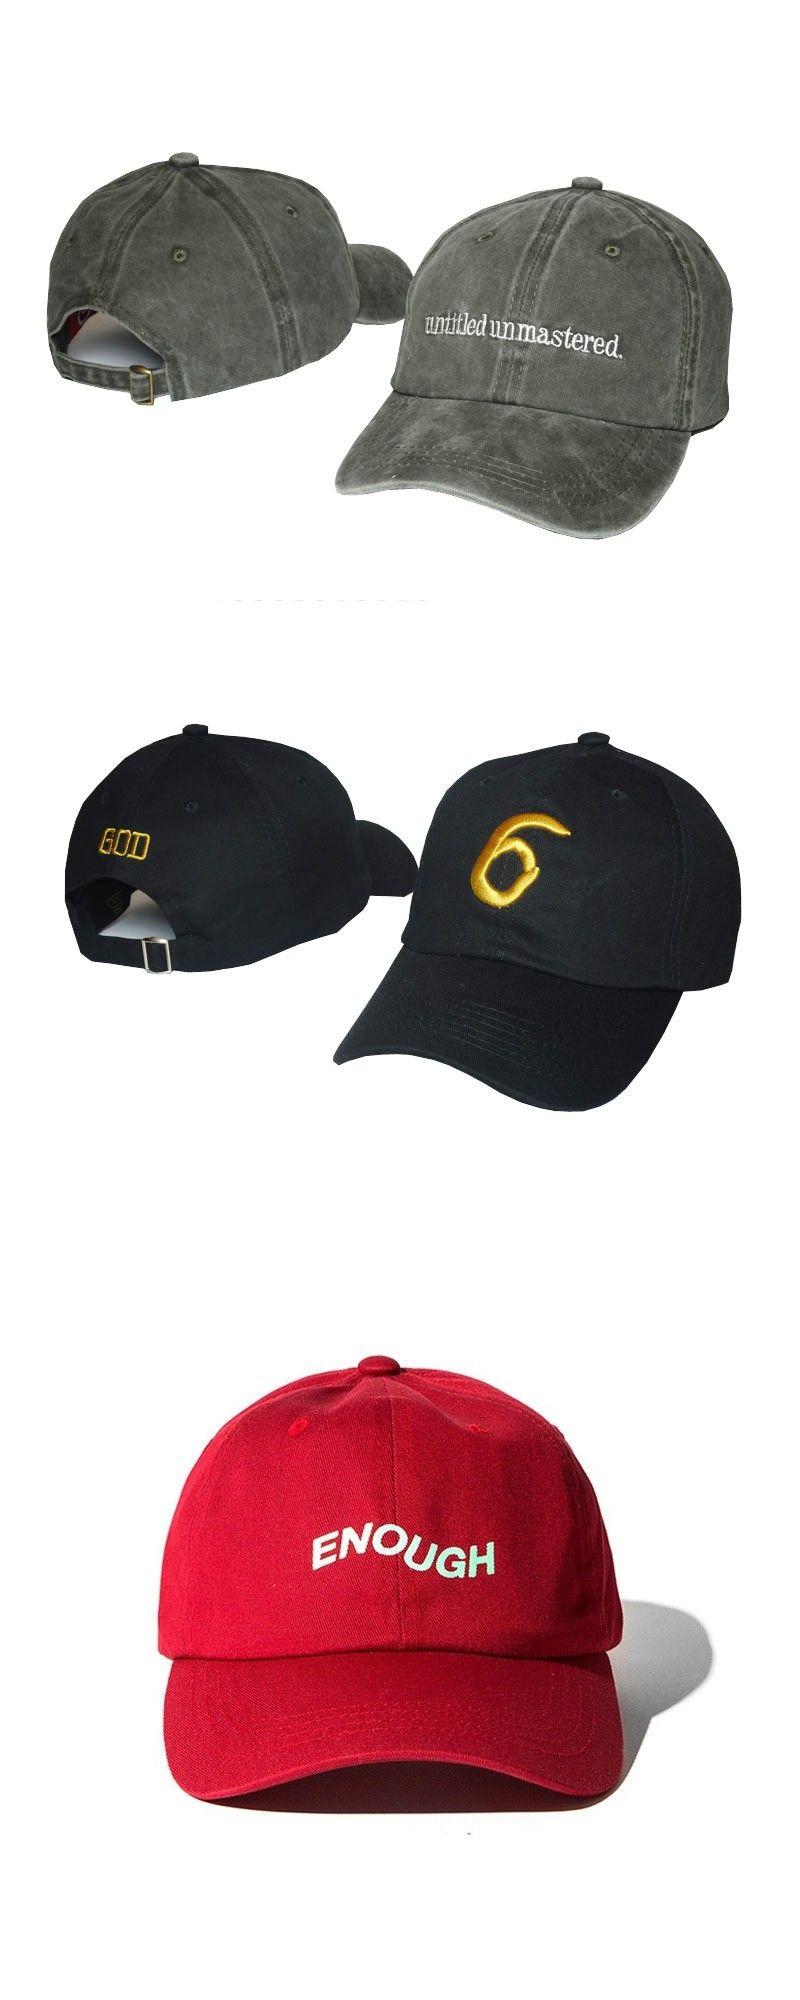 3b7d503173 Kendrick Lamar Olive Green Untitled Unmastered Daddy Hat Black Embroidery  Gold God 6 Dad Hat Red ENOUGH Snapback Baseball Cap  6.59